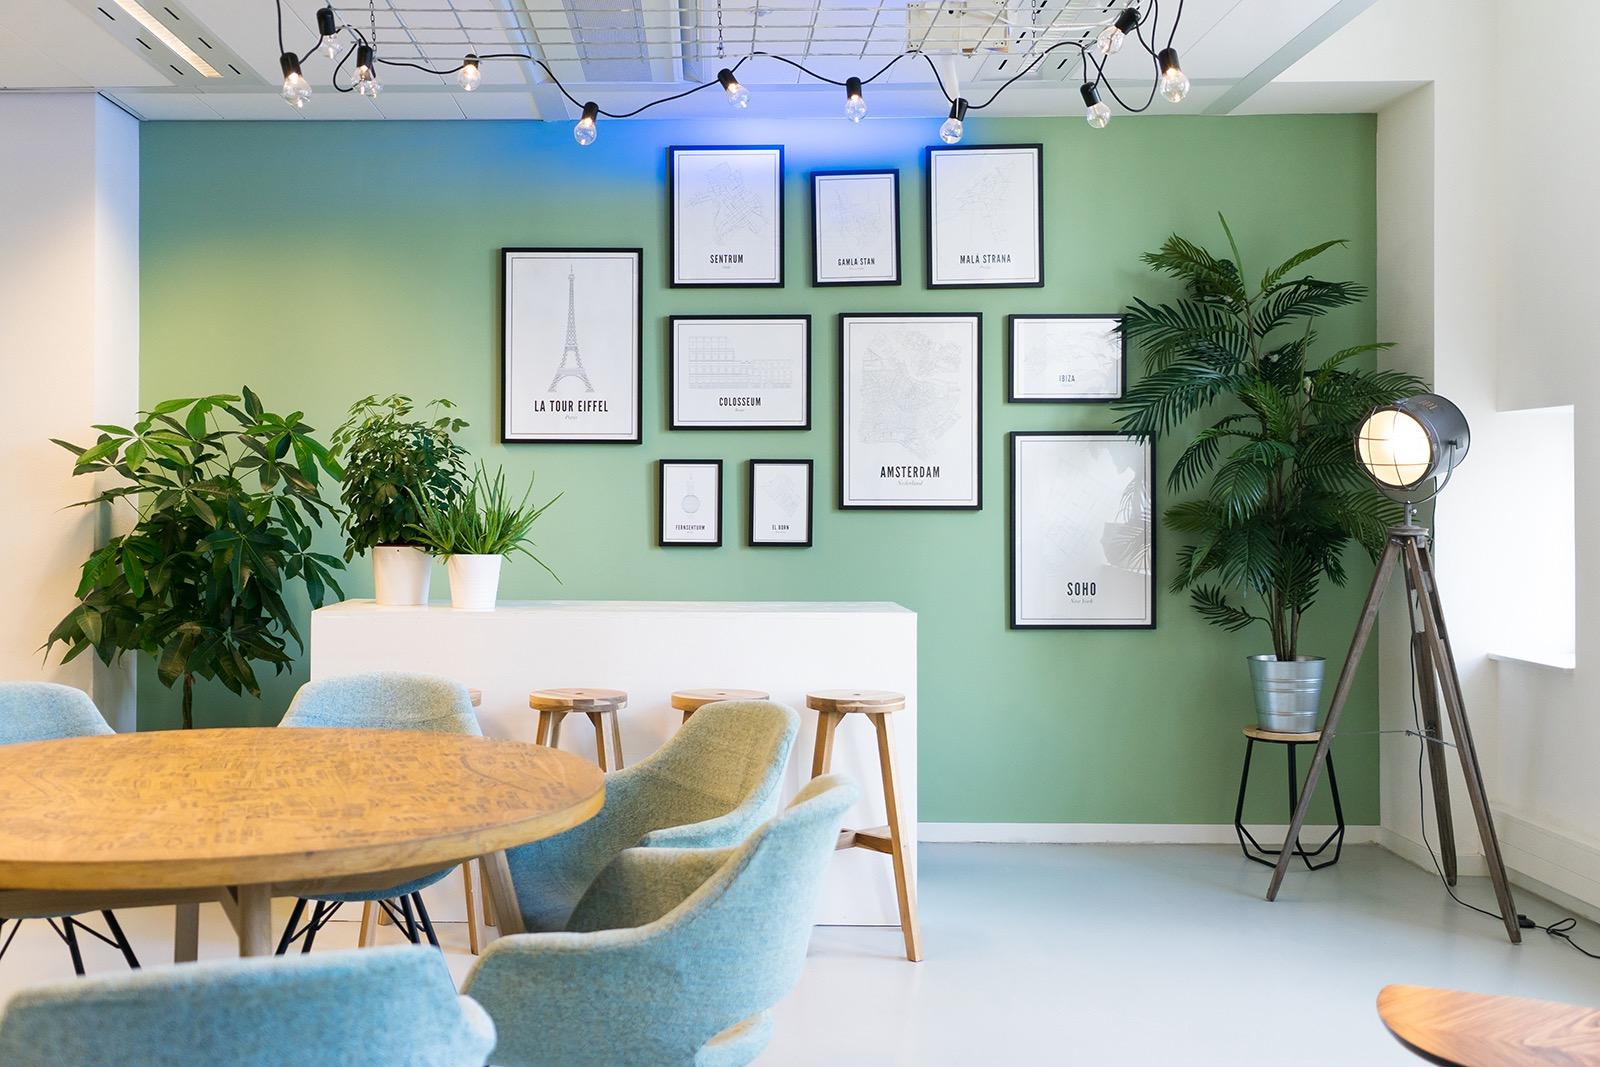 travelbird-amsterdam-office-5